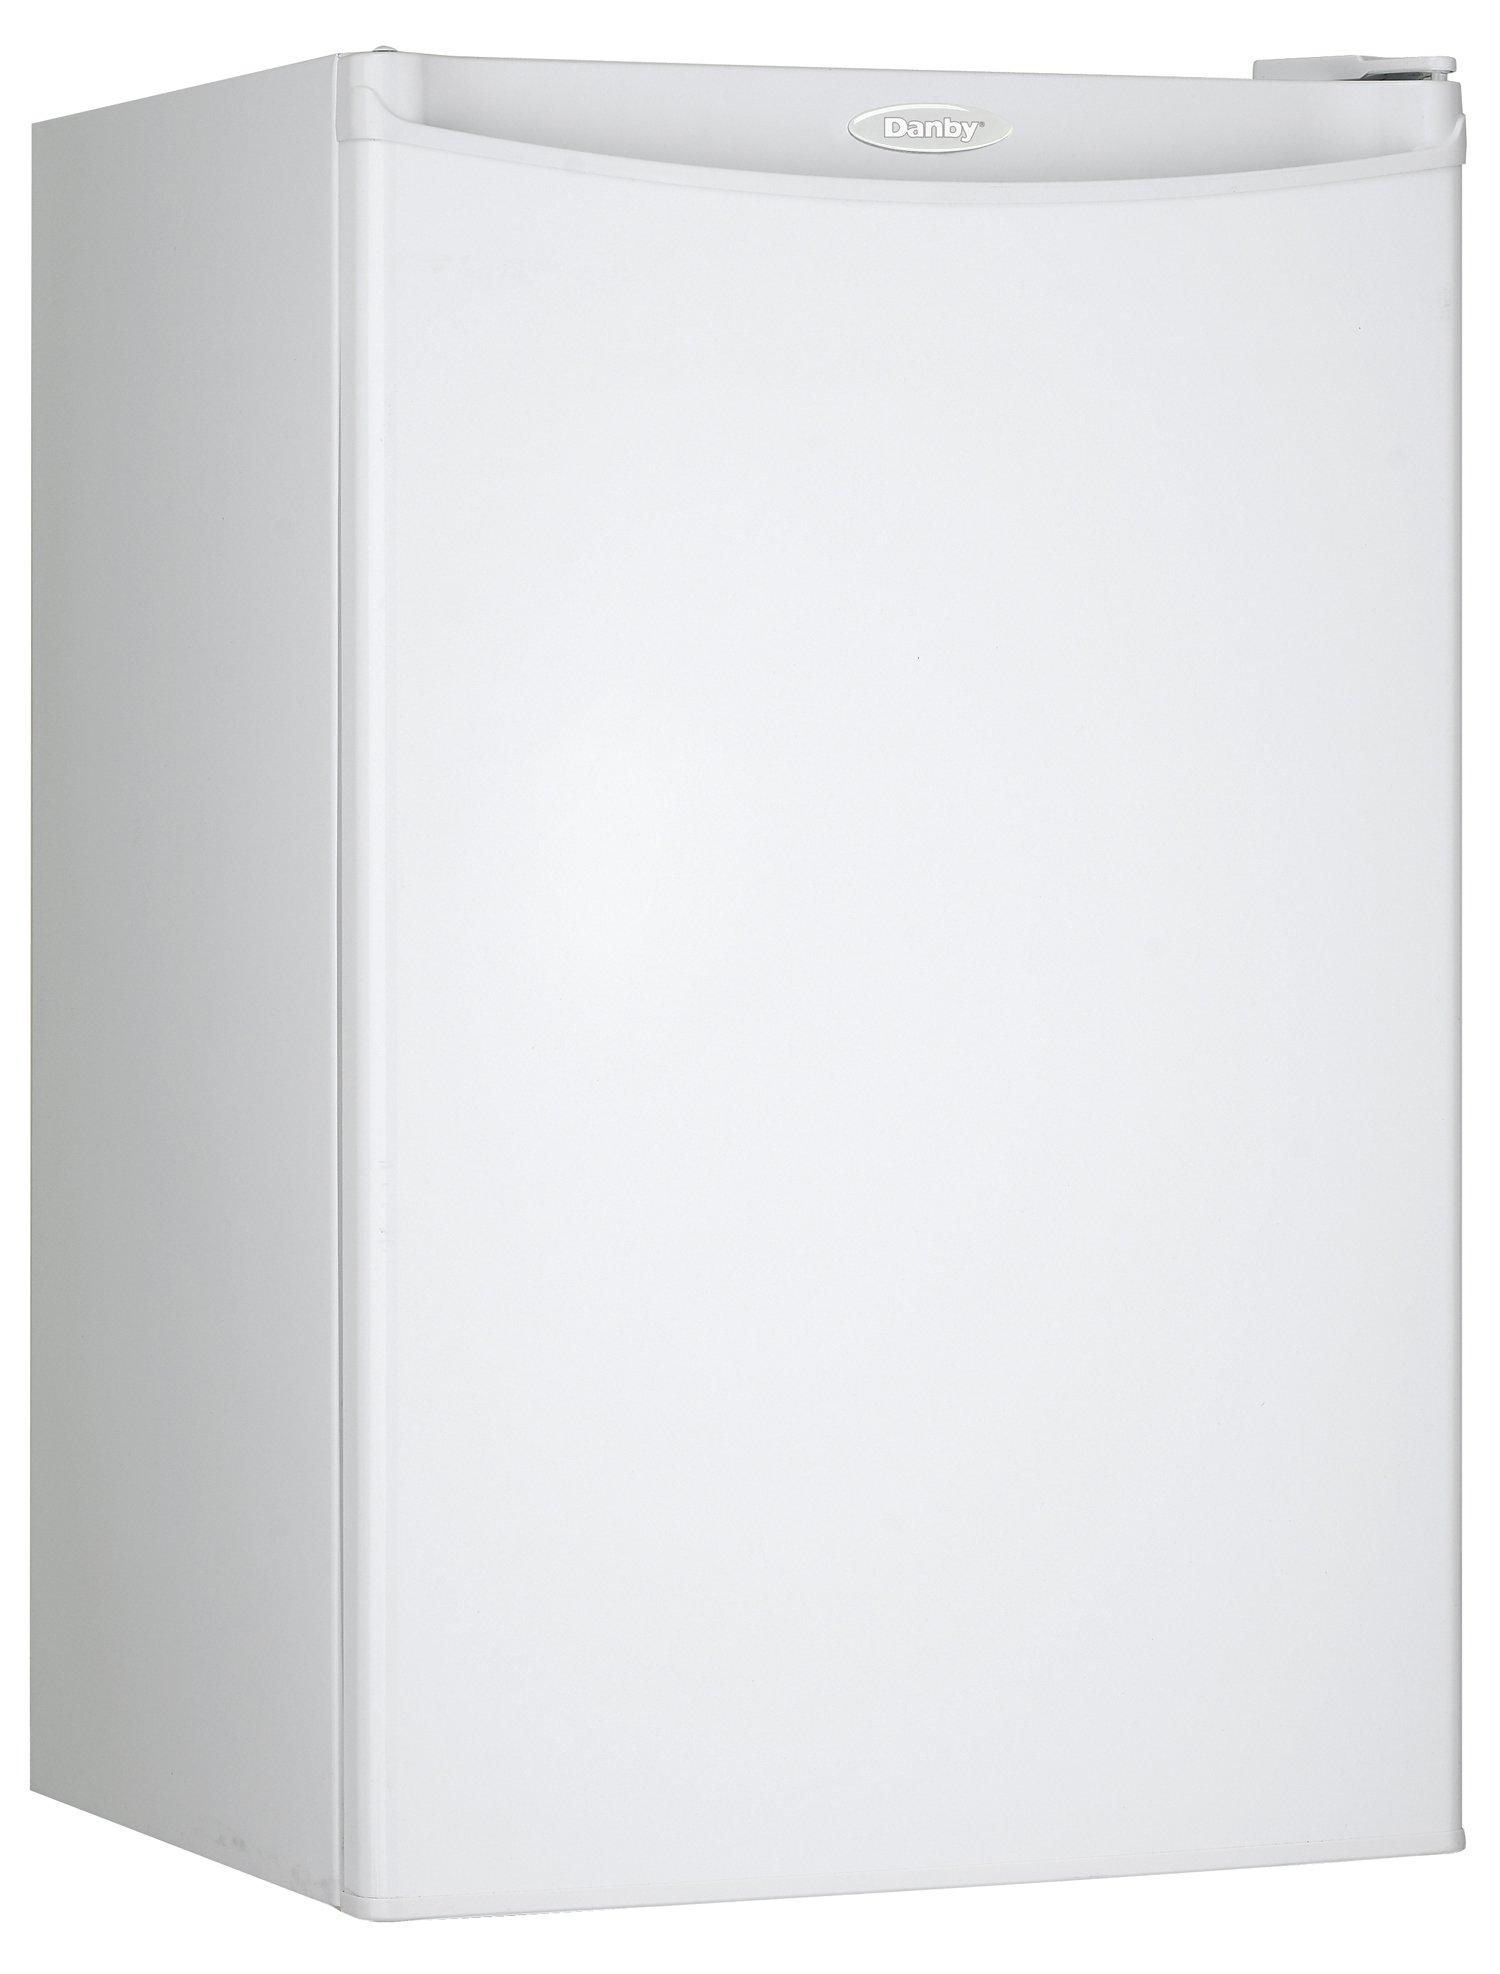 Danby DUFM032A1WDB 3.2 Cubic Feet Upright Freezer, White